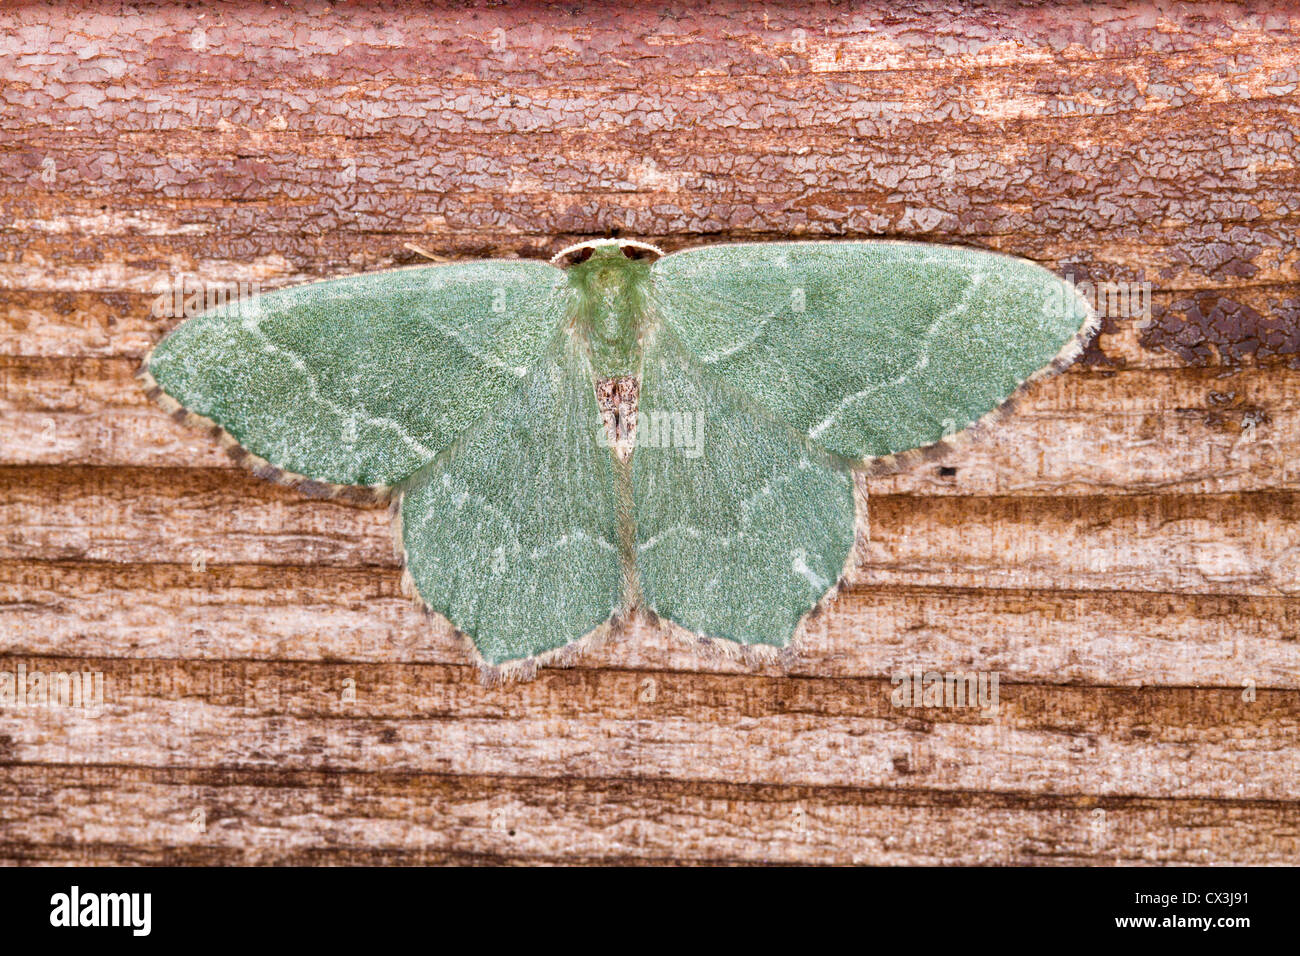 Small Emerald Moth; Hemistola chrysoprasaria; UK - Stock Image